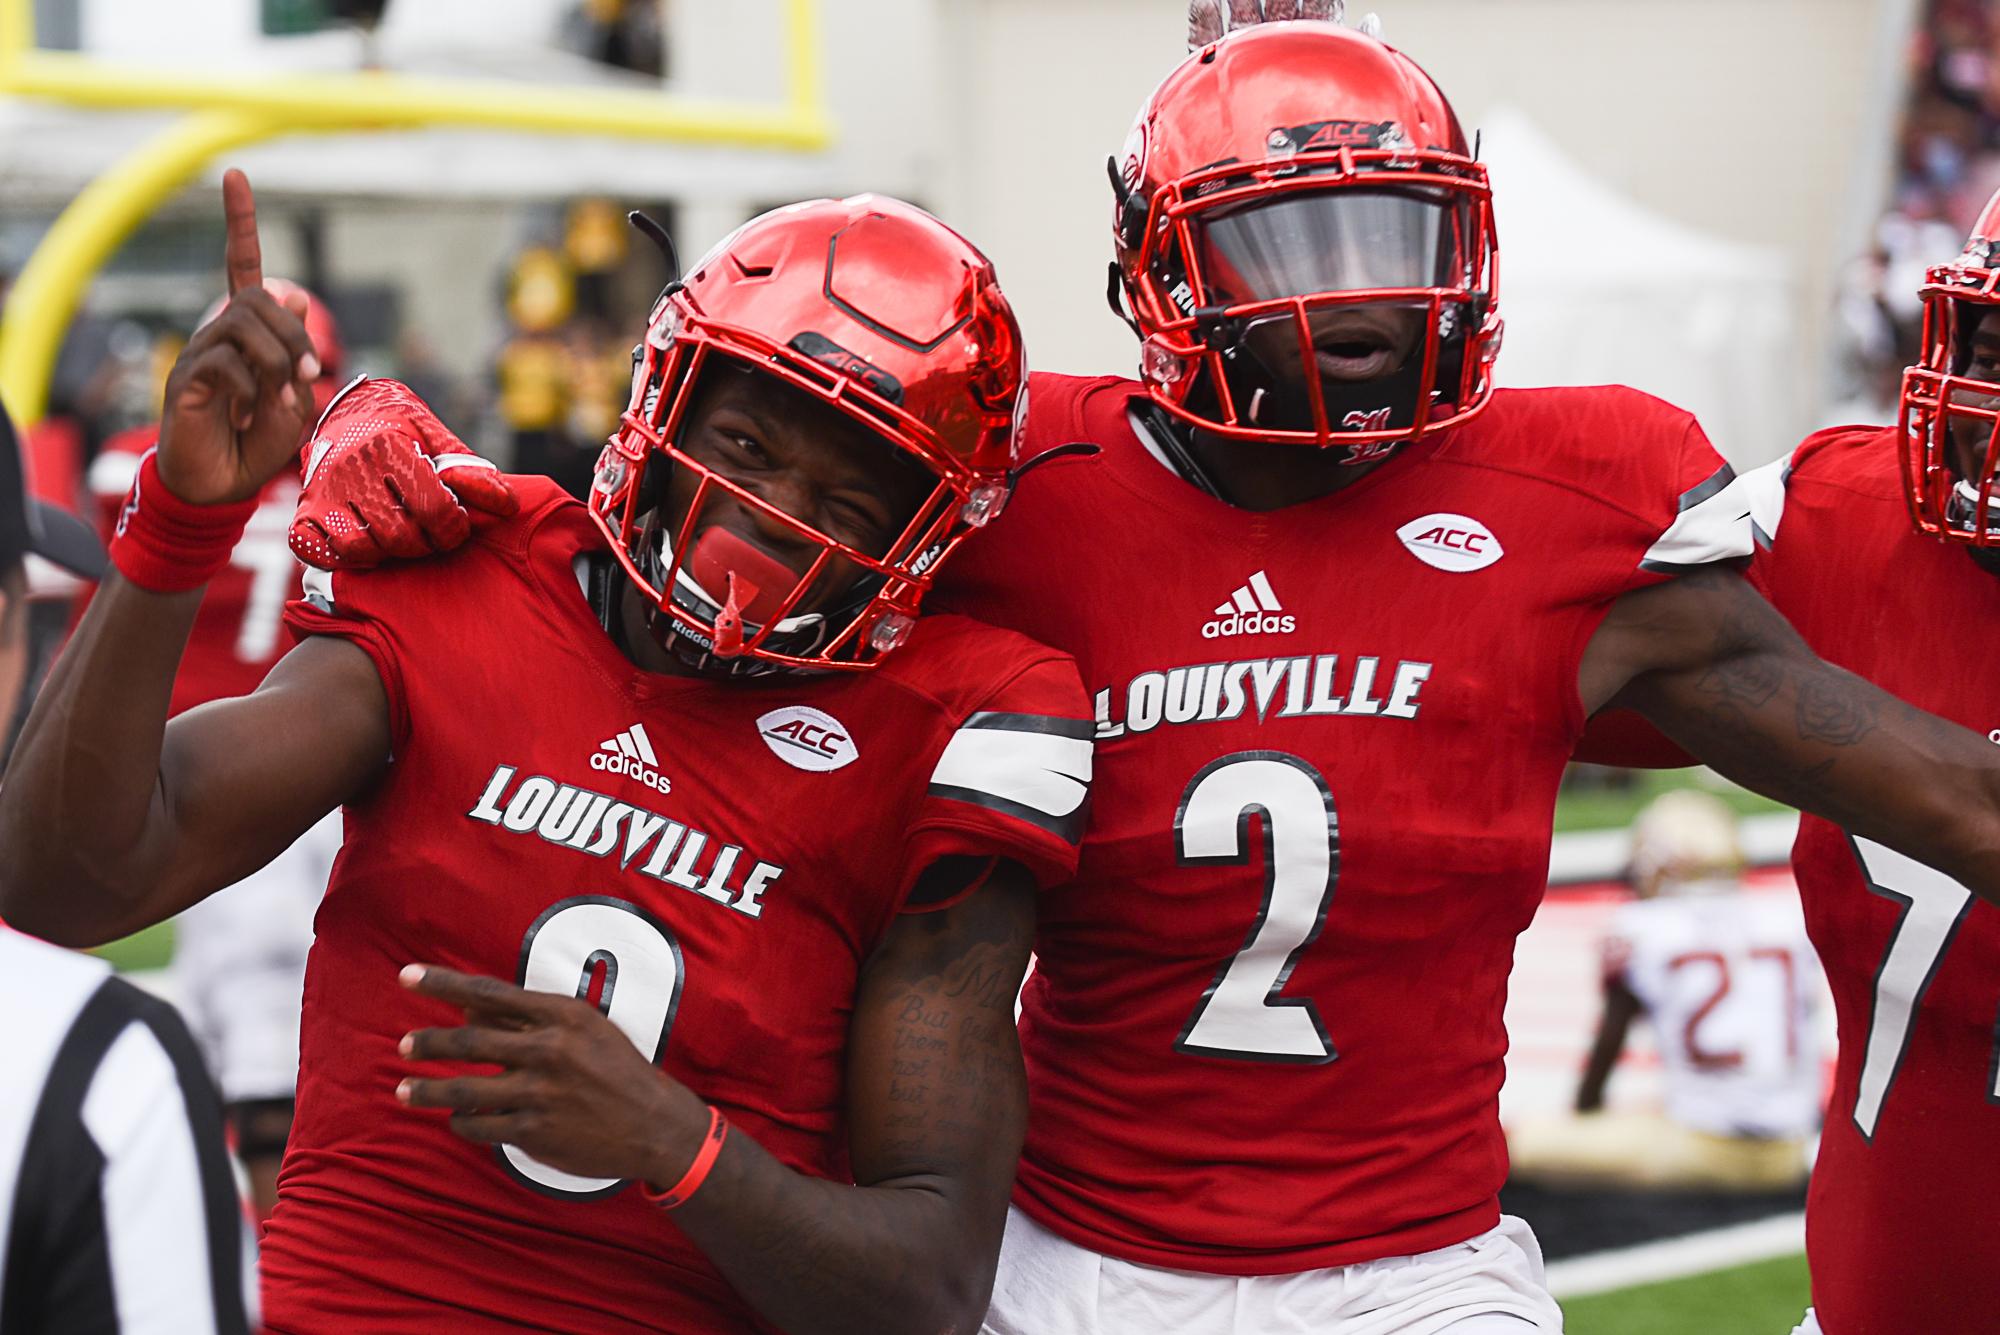 Jackson and Staples Celebrate the win over FSU